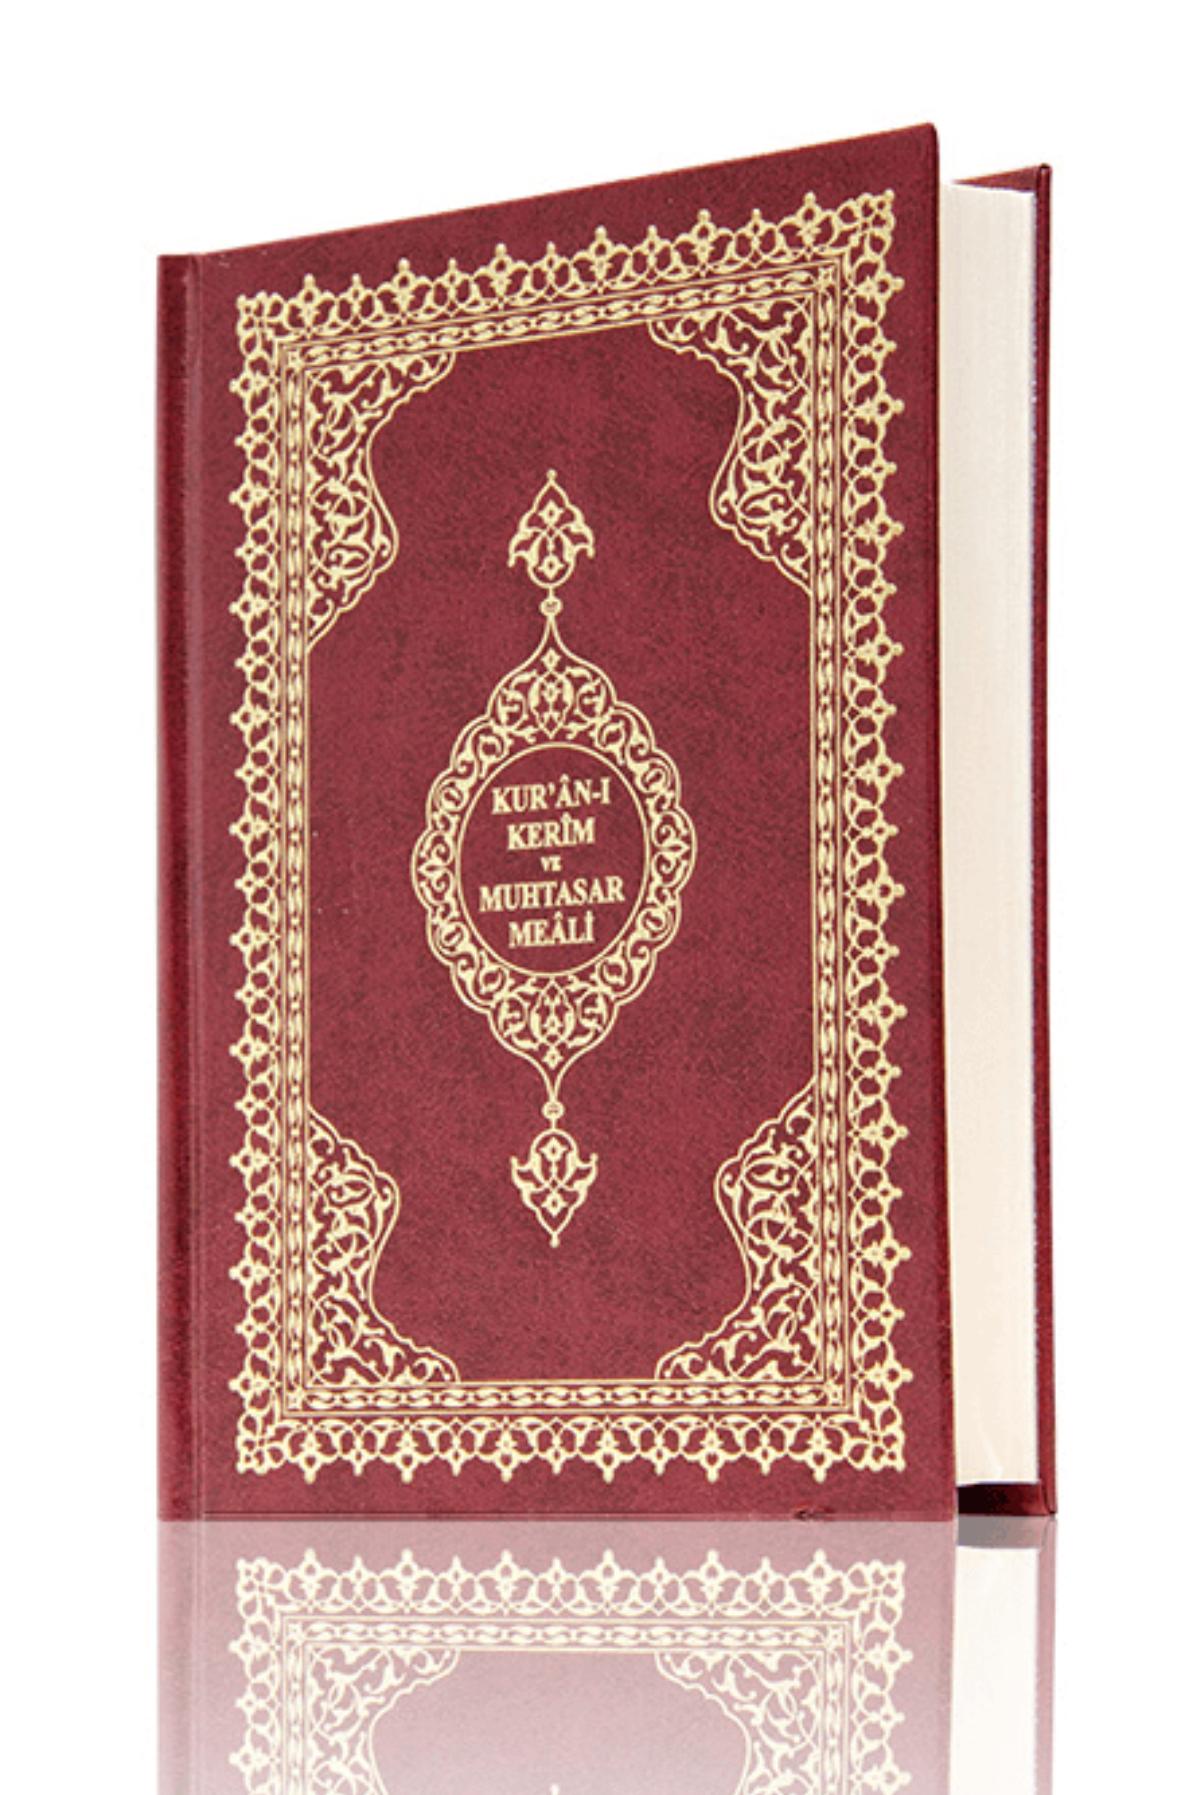 Quran Karim - Arabic and Meal - Mealli Koran Karim - Computer Lined - Medium Size - Sealed - Hayrat Nesriyat